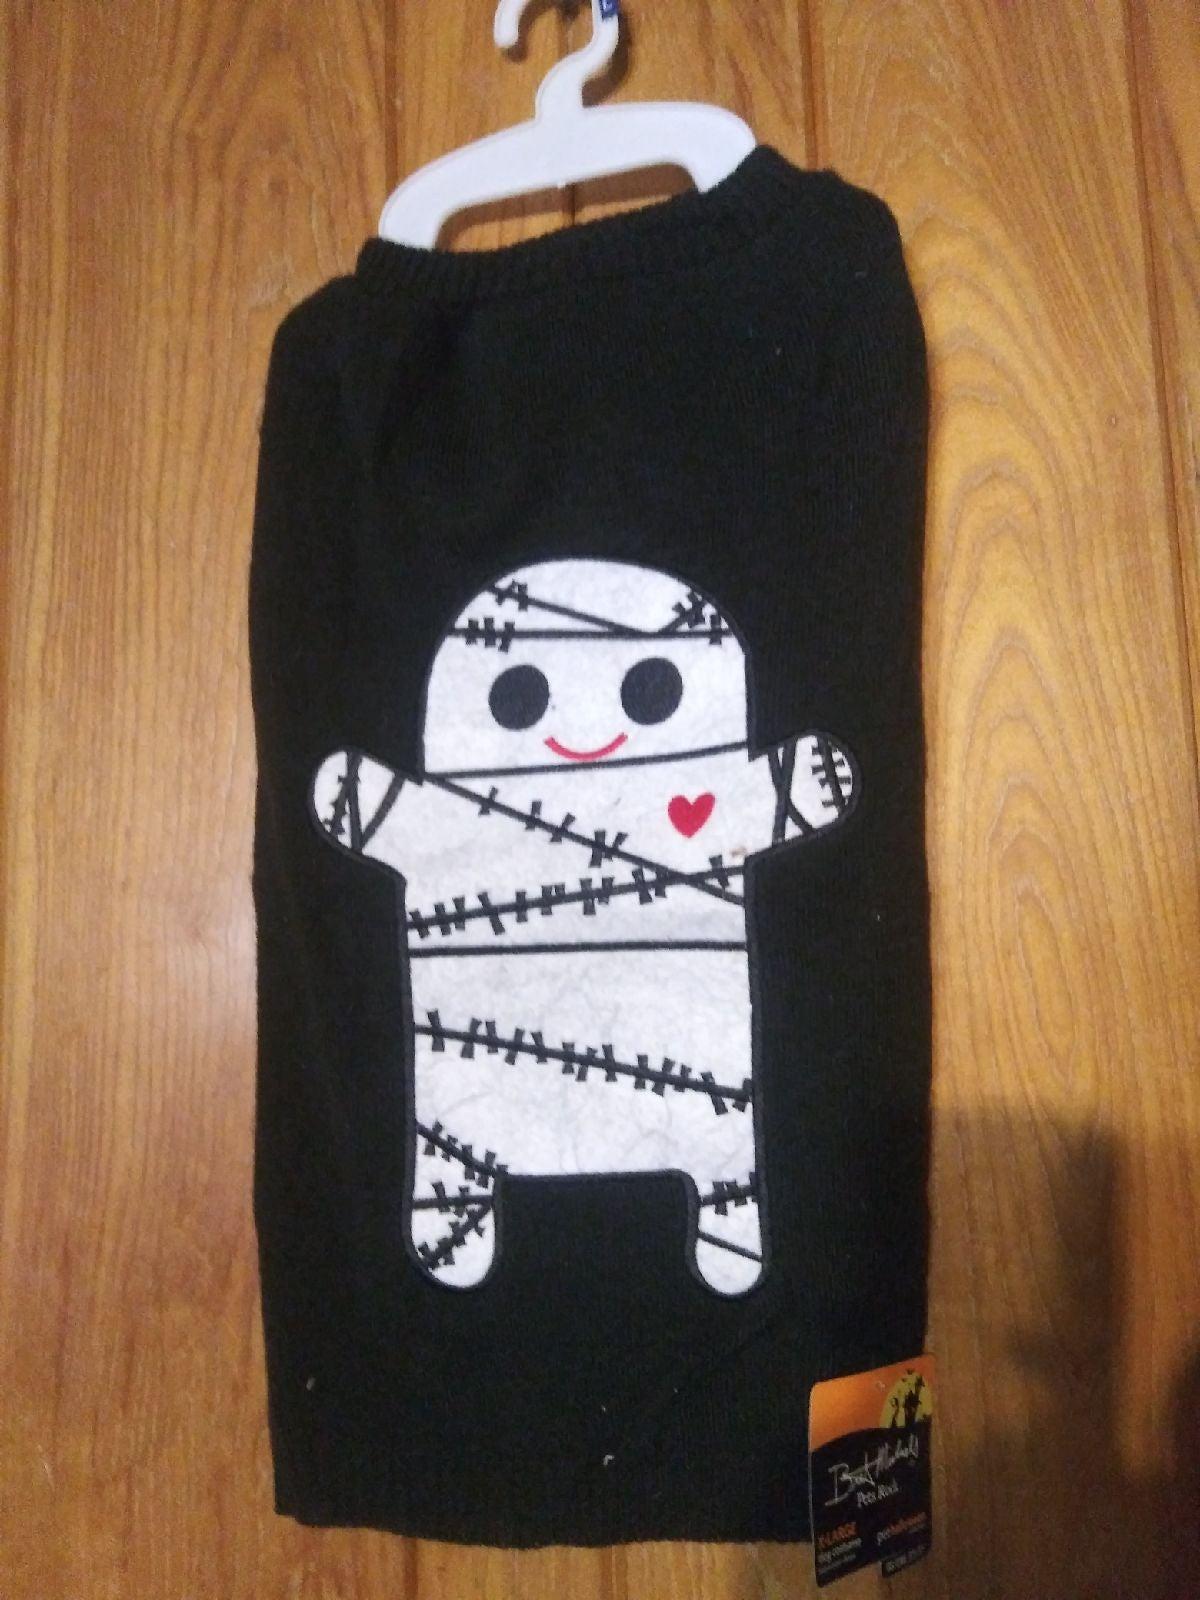 bret Michaels Halloween sweater